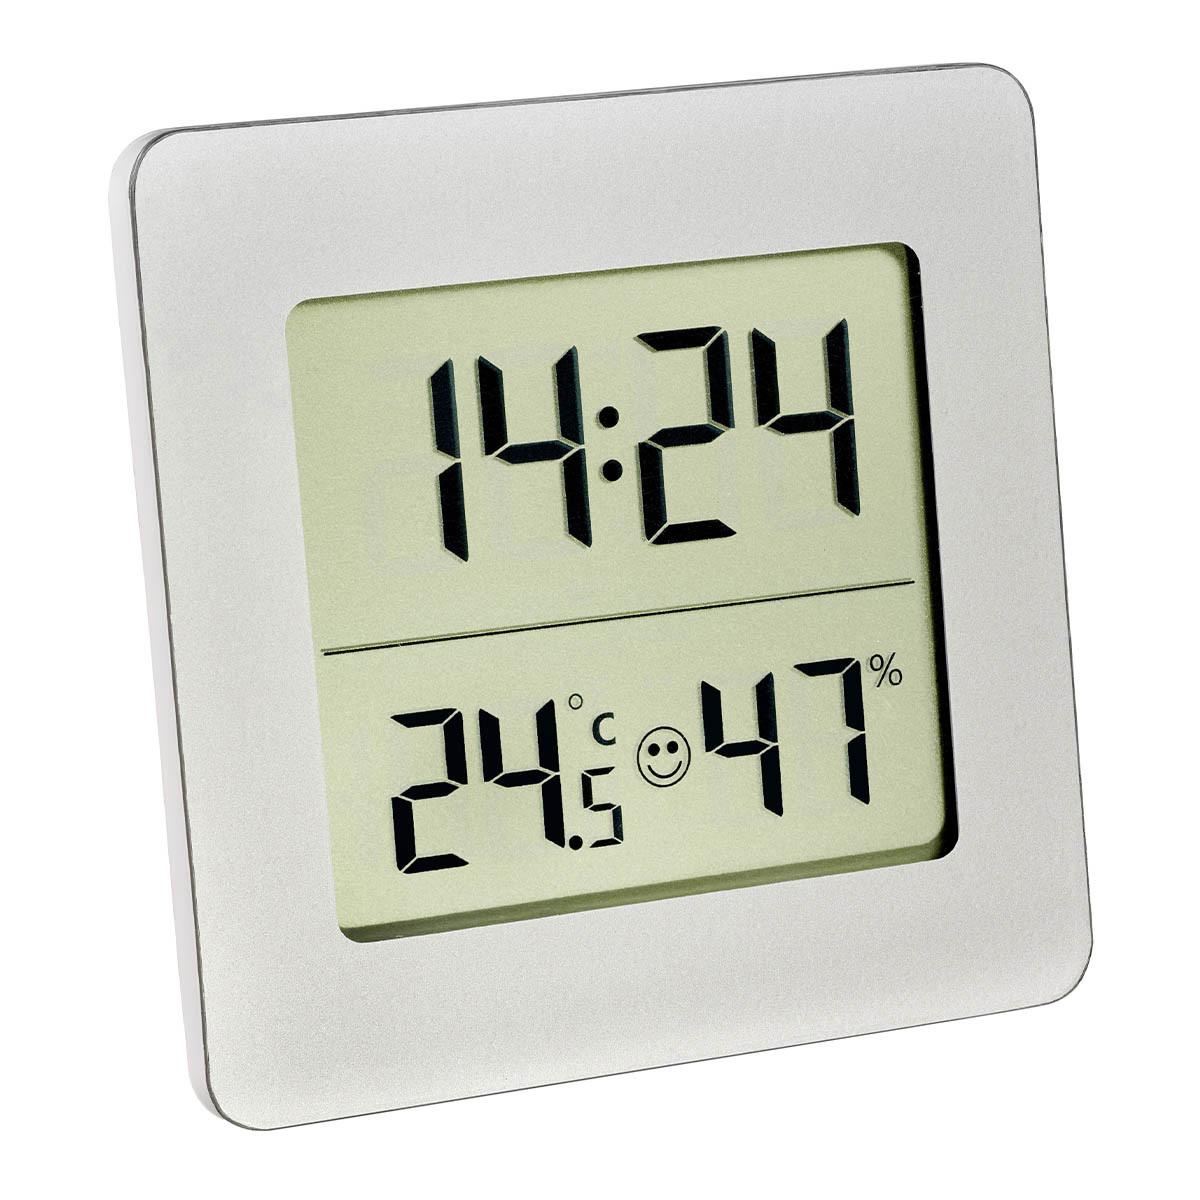 30-5038-54-digitales-thermo-hygrometer-1200x1200px.jpg